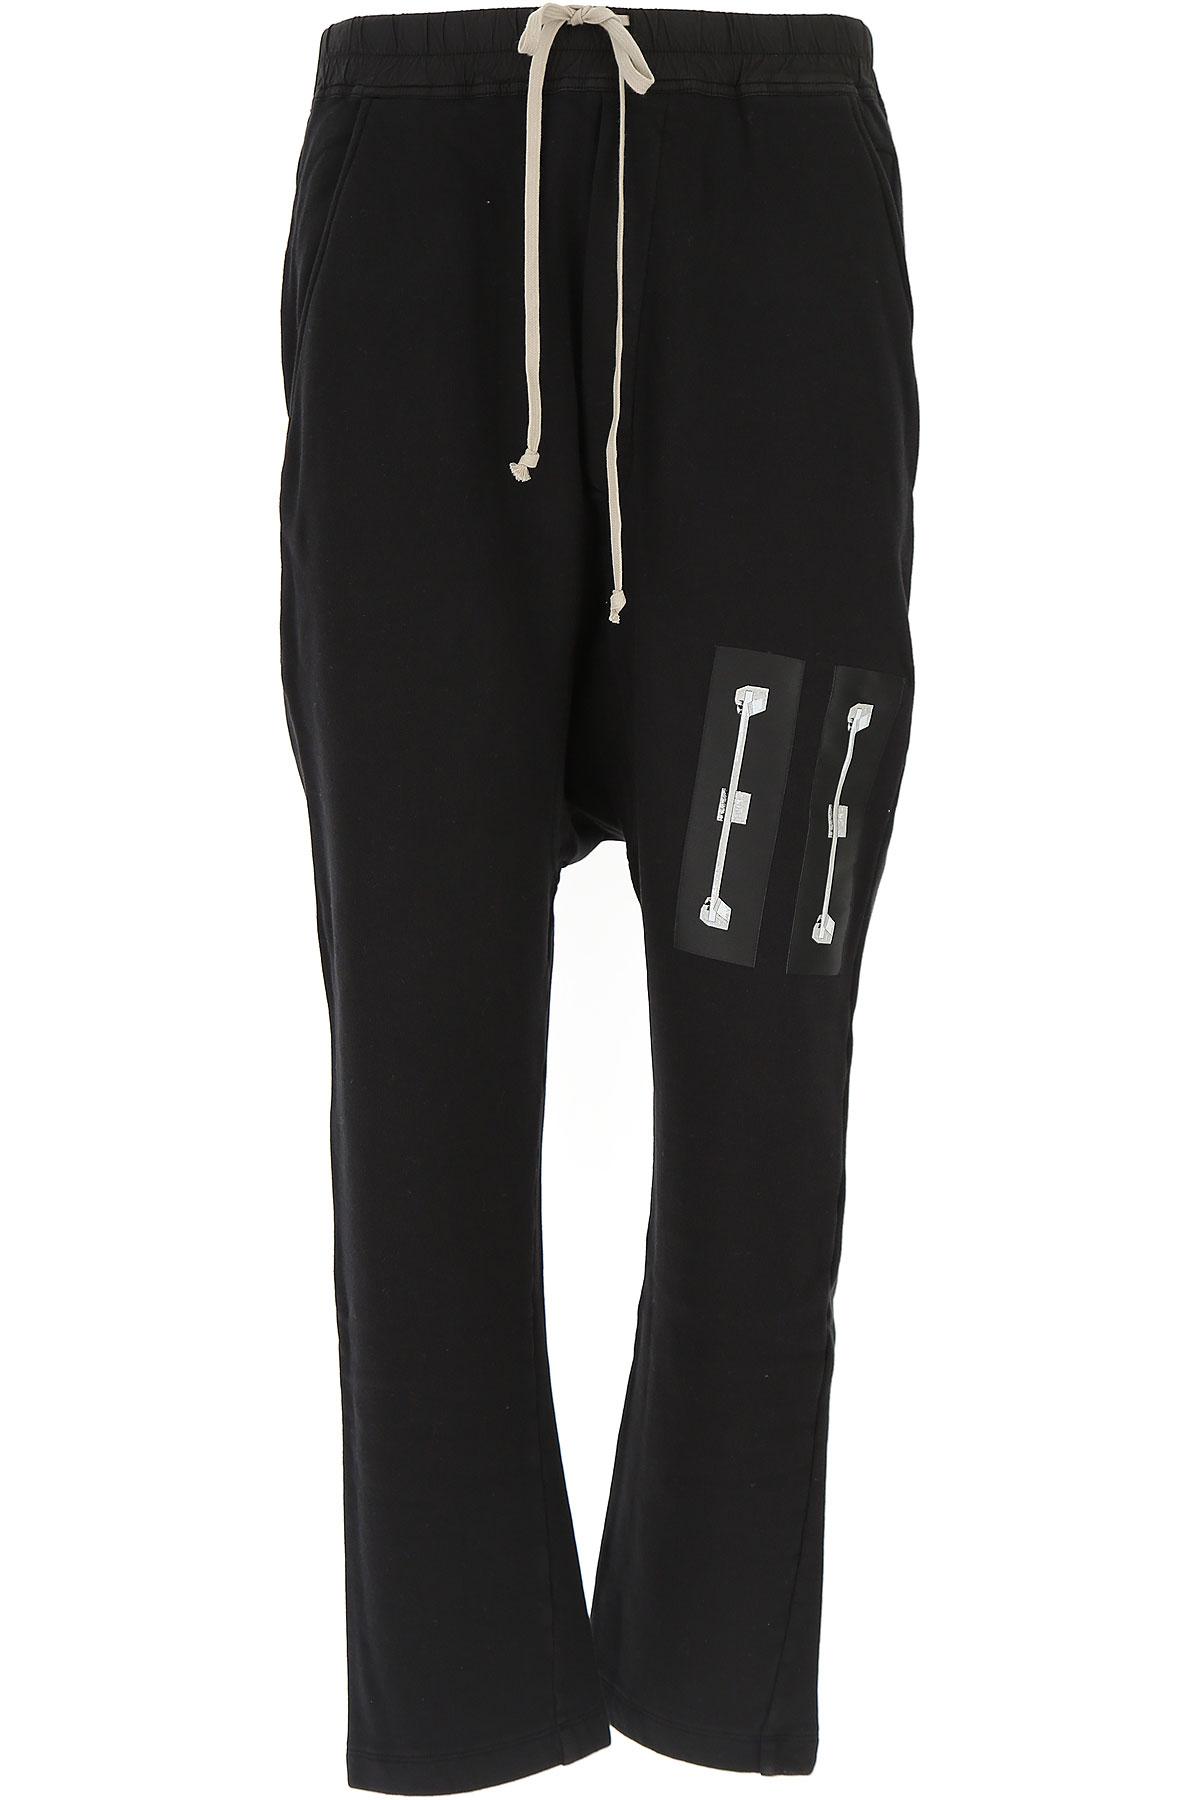 Image of Rick Owens DRKSHDW Mens Clothing, Black, Cotton, 2017, L M S